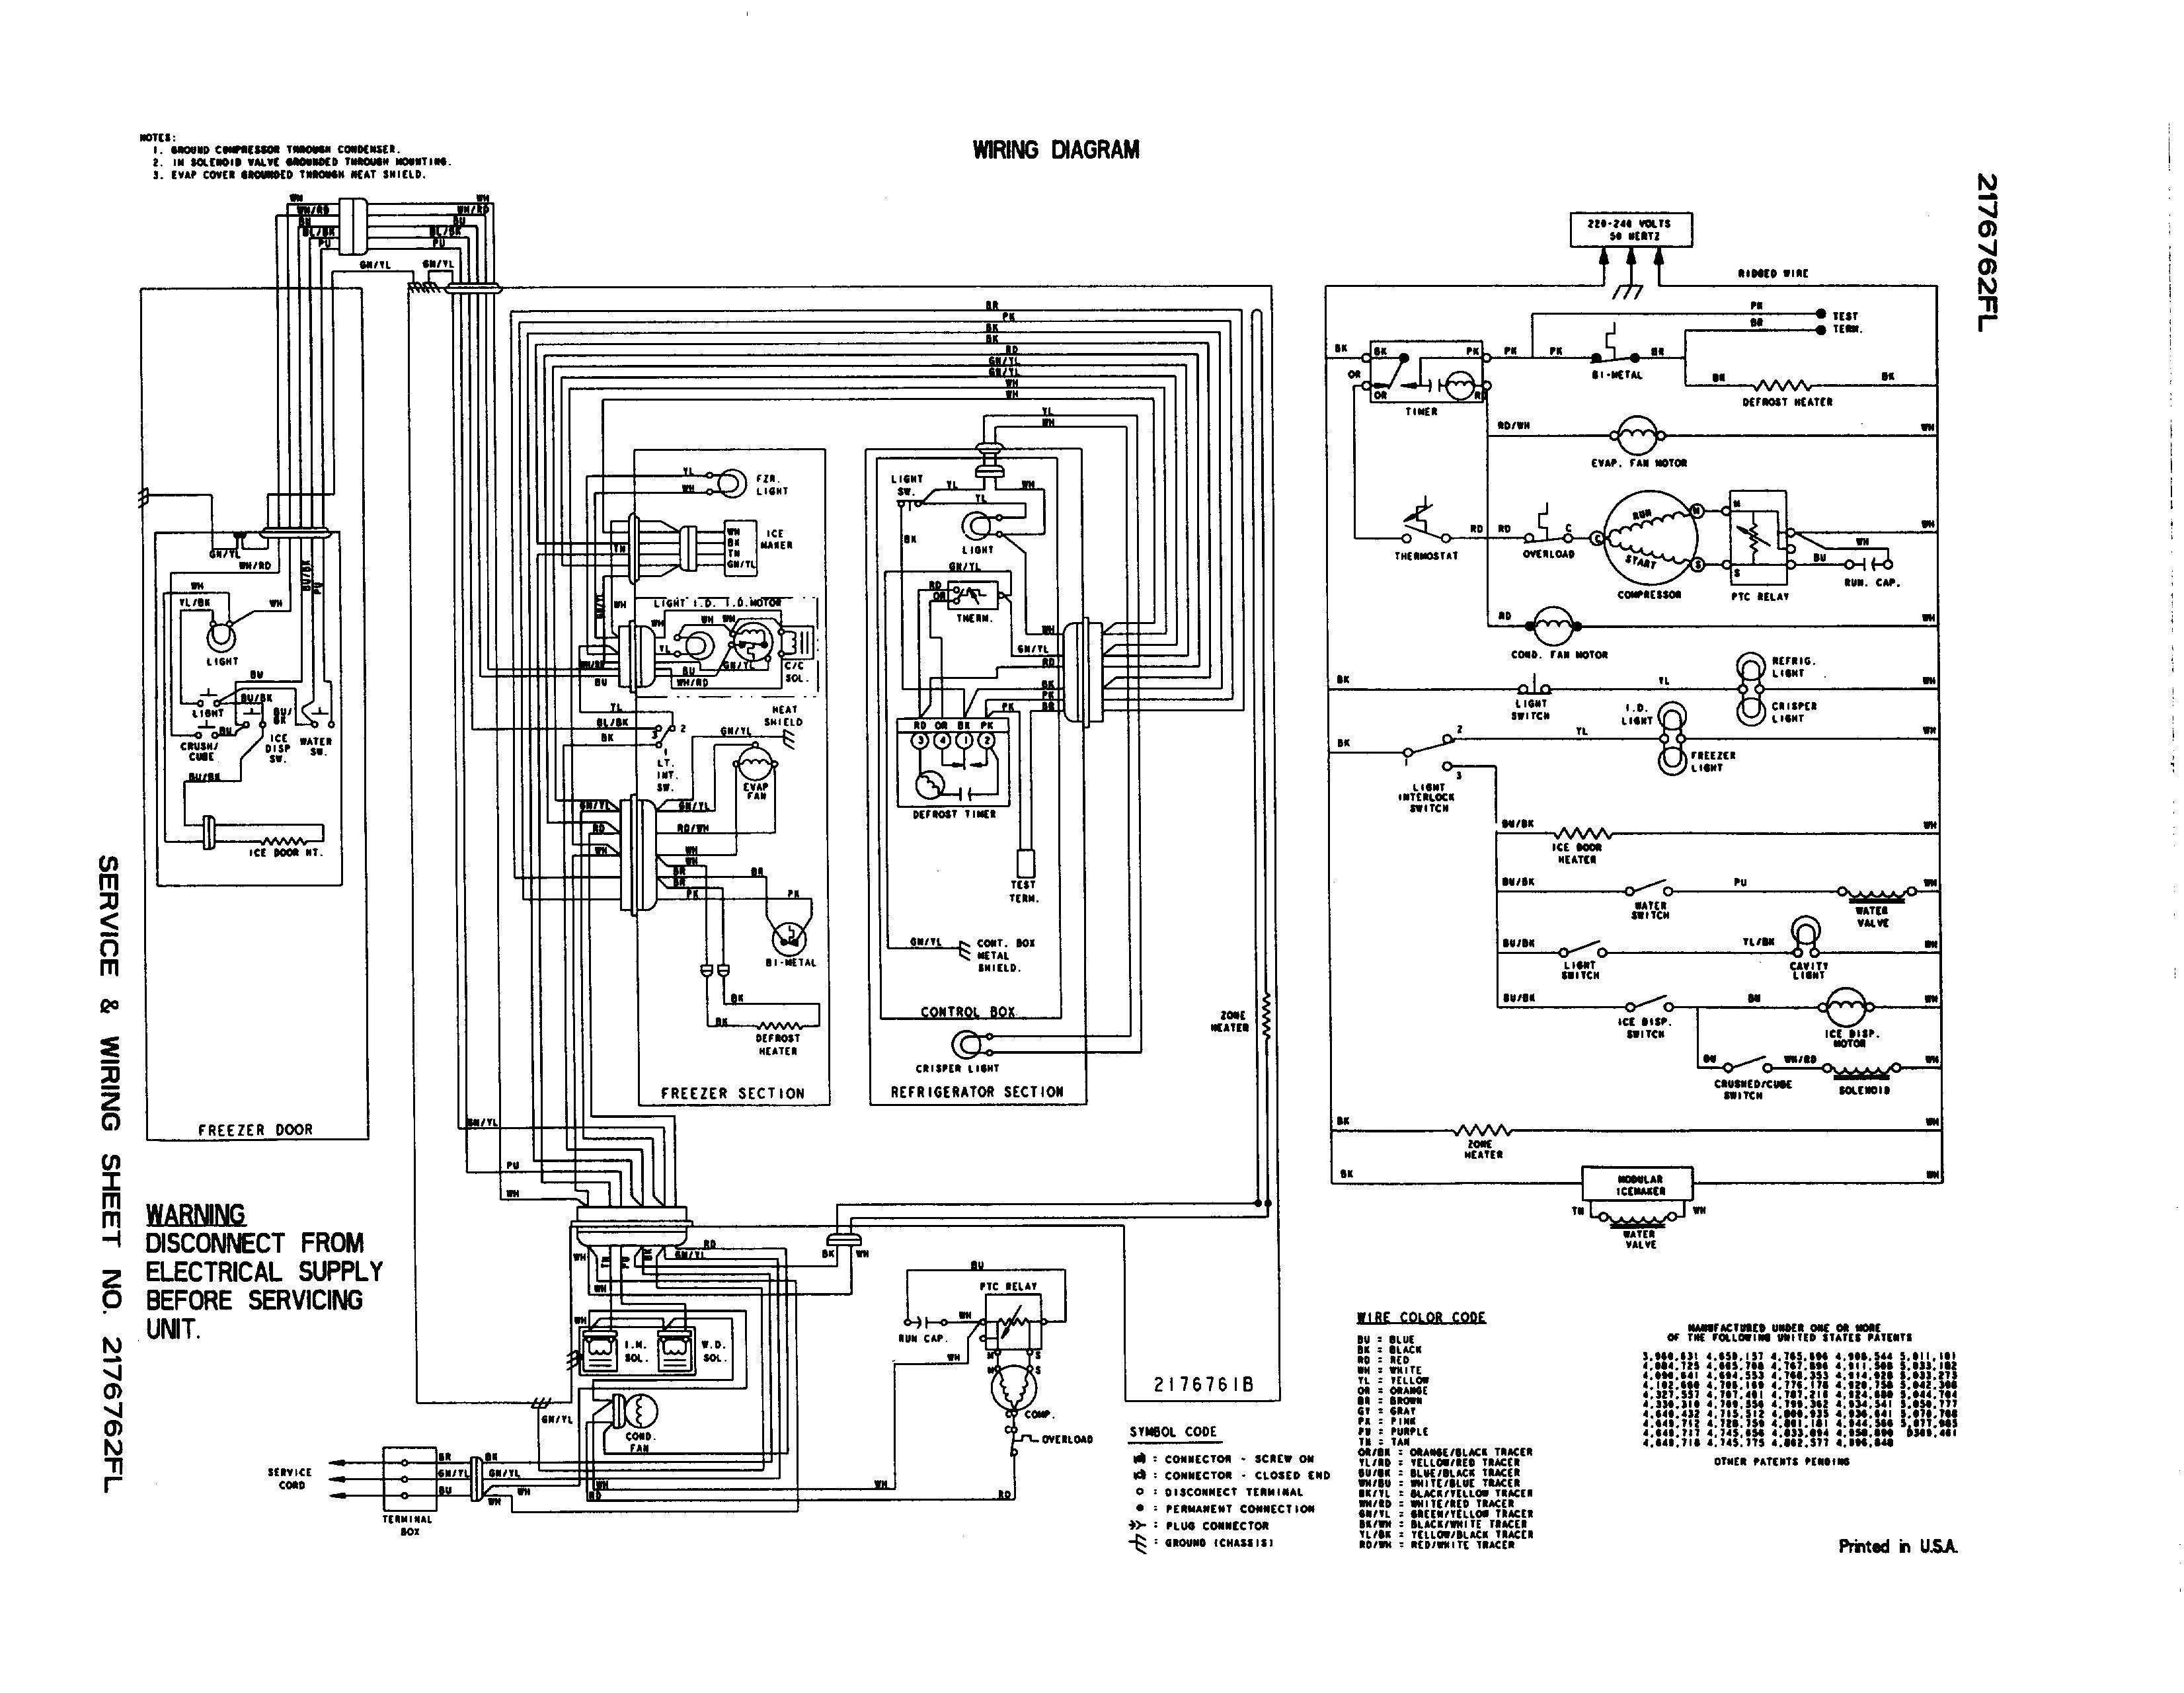 Terrific Ice Maker Schematic Diagram Free Download Wiring Diagram Schematic Wiring Cloud Rometaidewilluminateatxorg